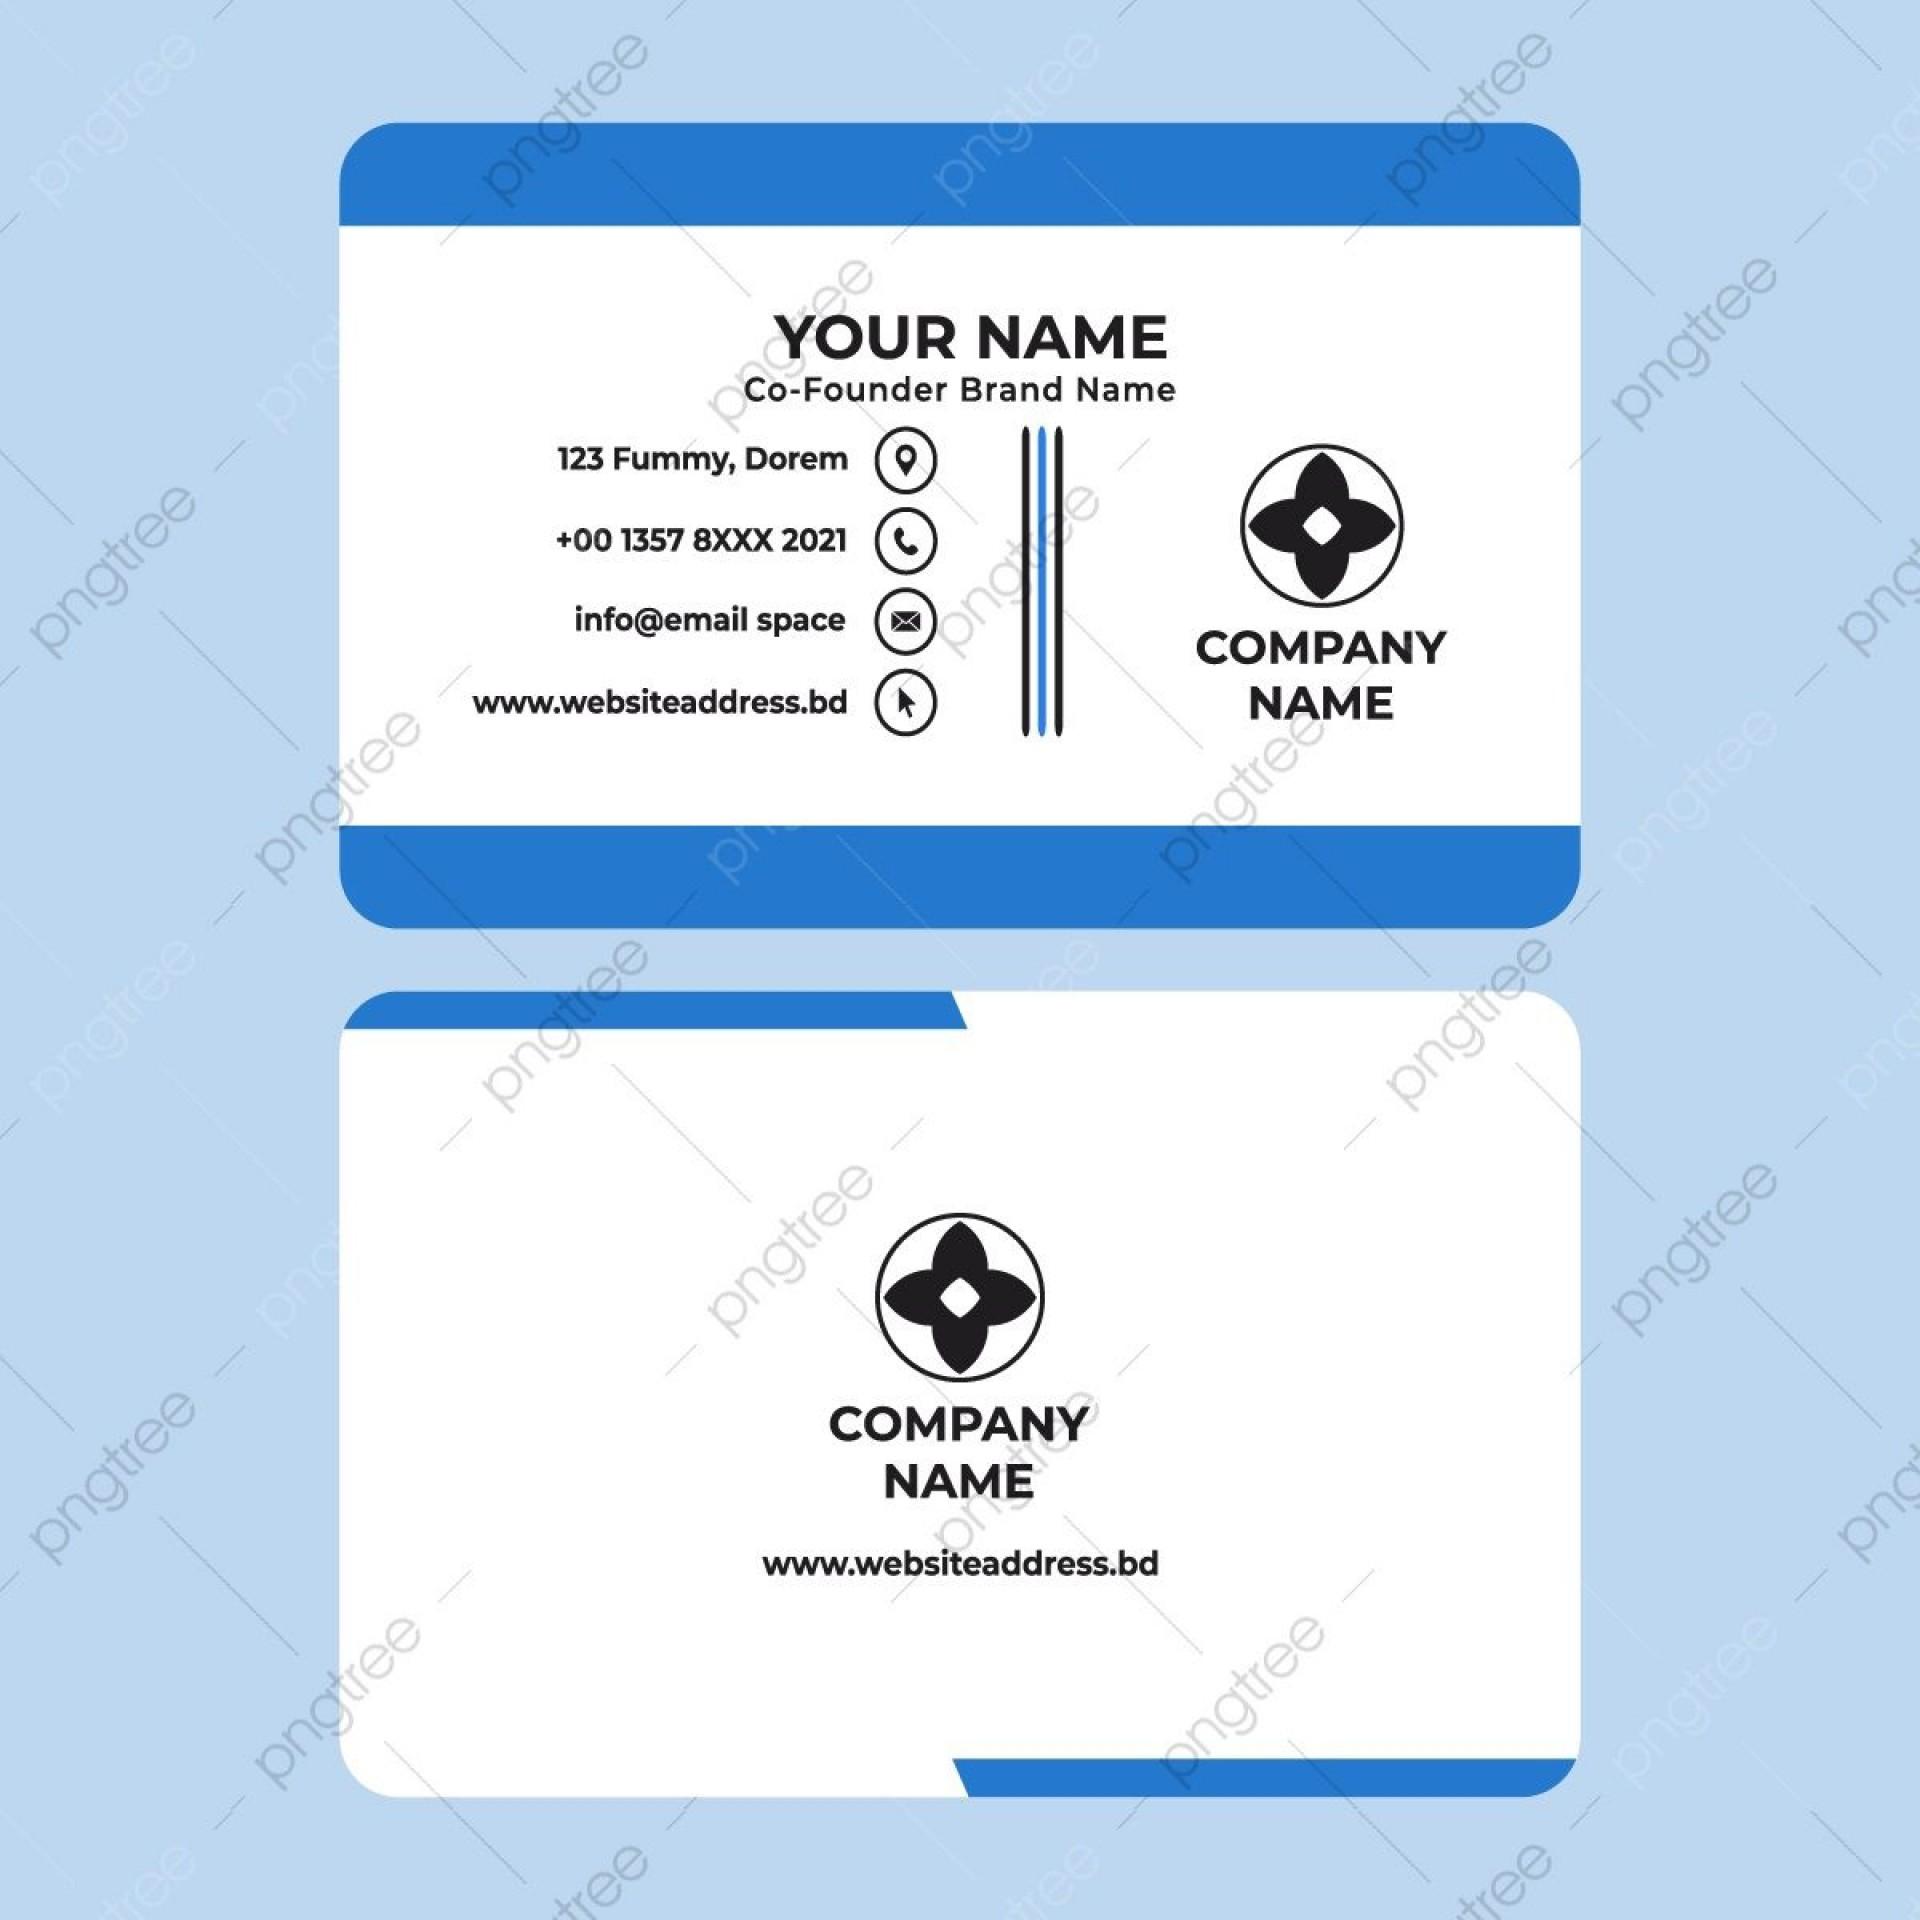 007 Sensational Simple Visiting Card Design Photo  Busines Idea Psd File Free Download1920